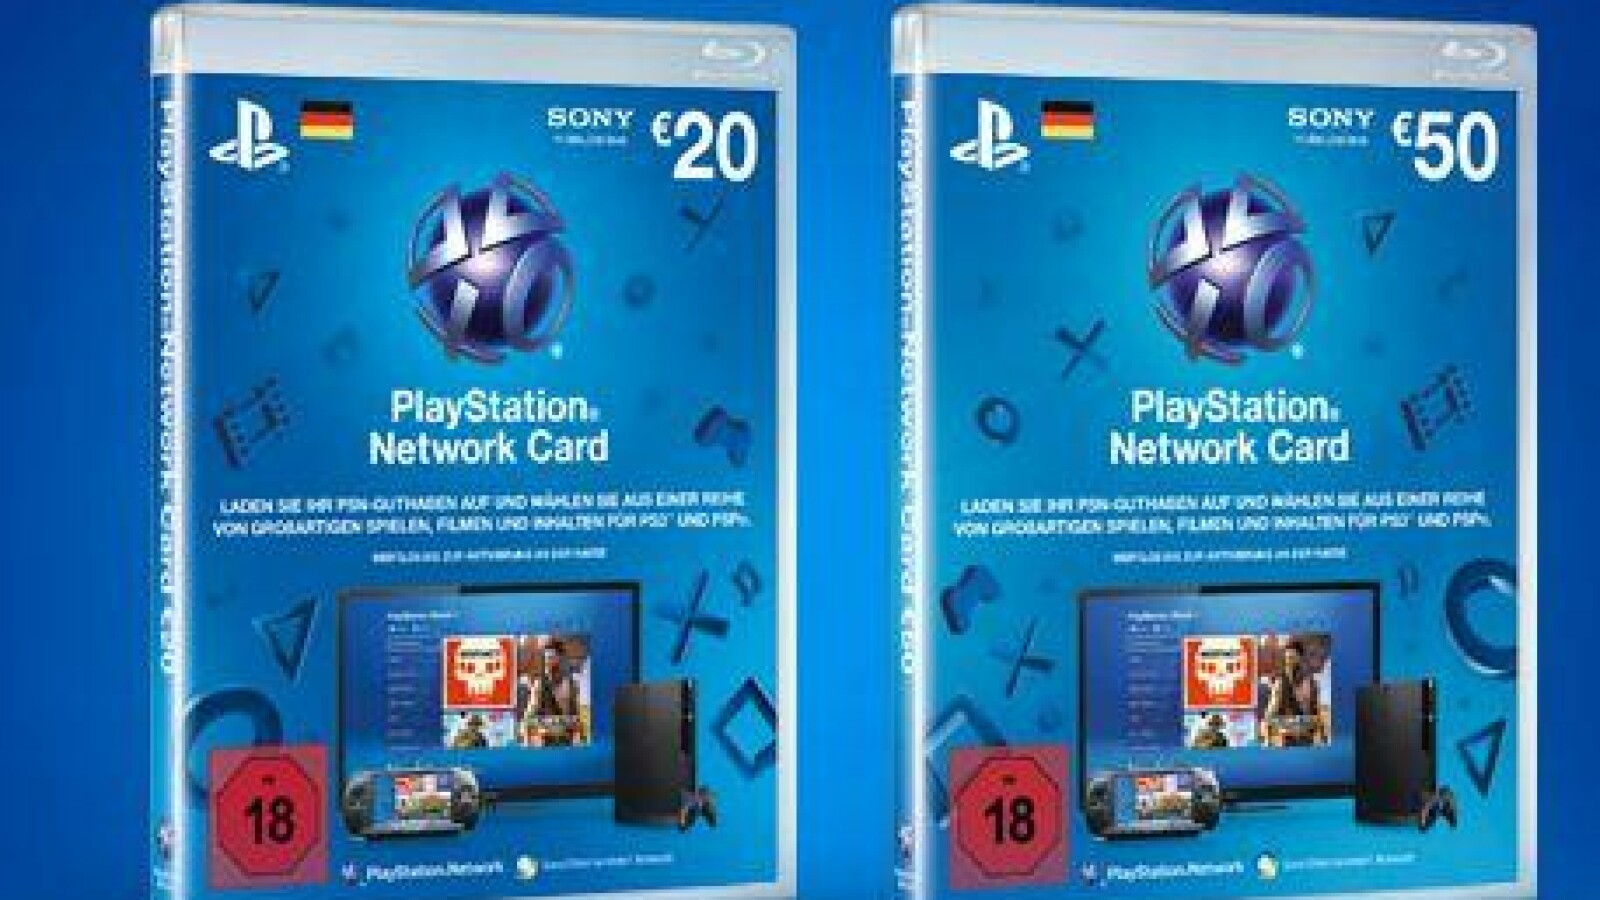 Psn Card Netzwelt Playstation Network 200